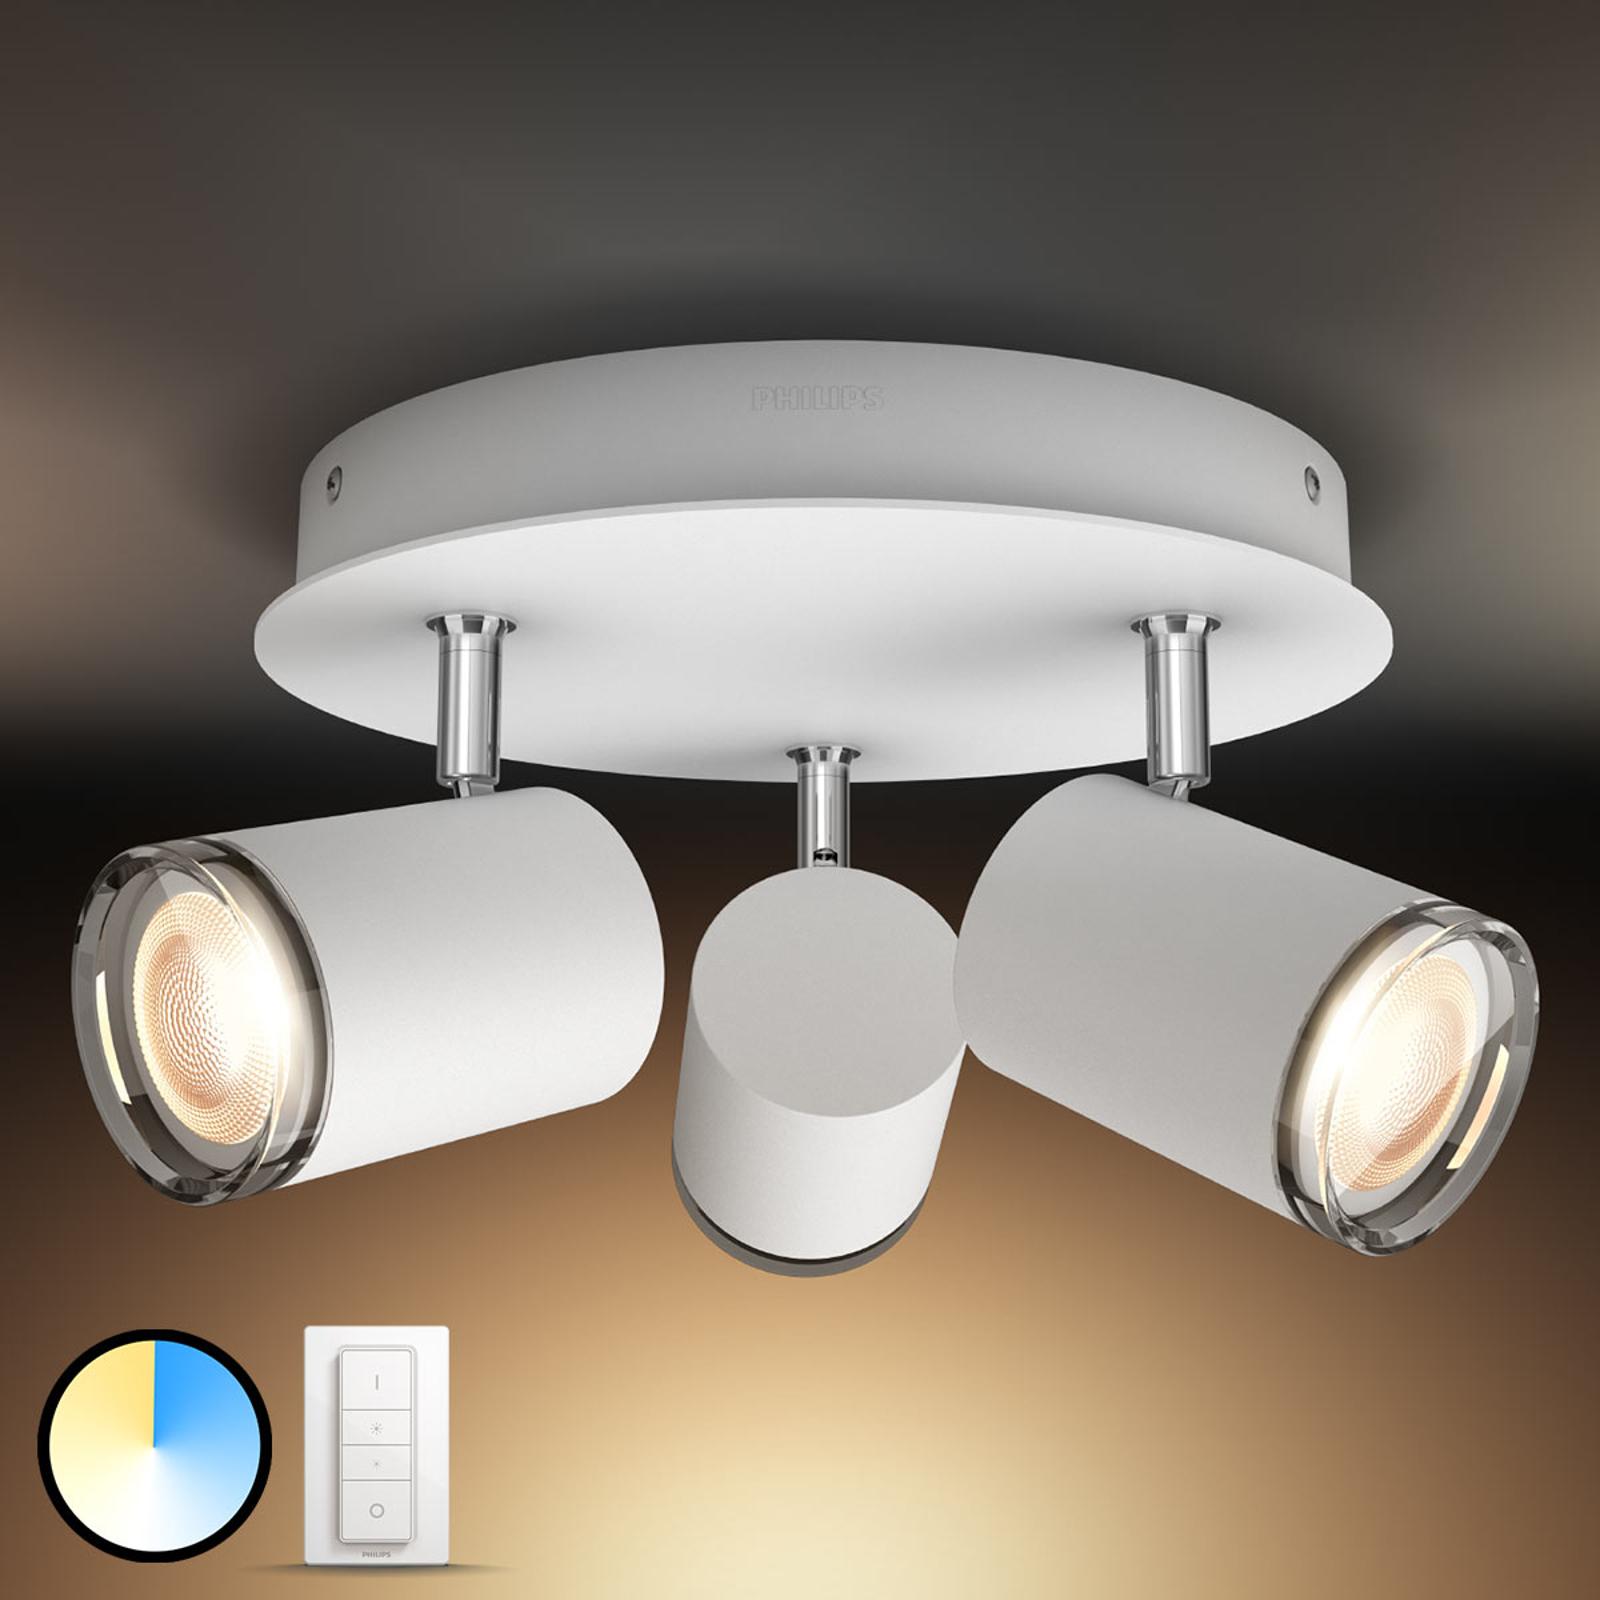 PhilipsHue White Ambiance Adore lampa sufitowa LED